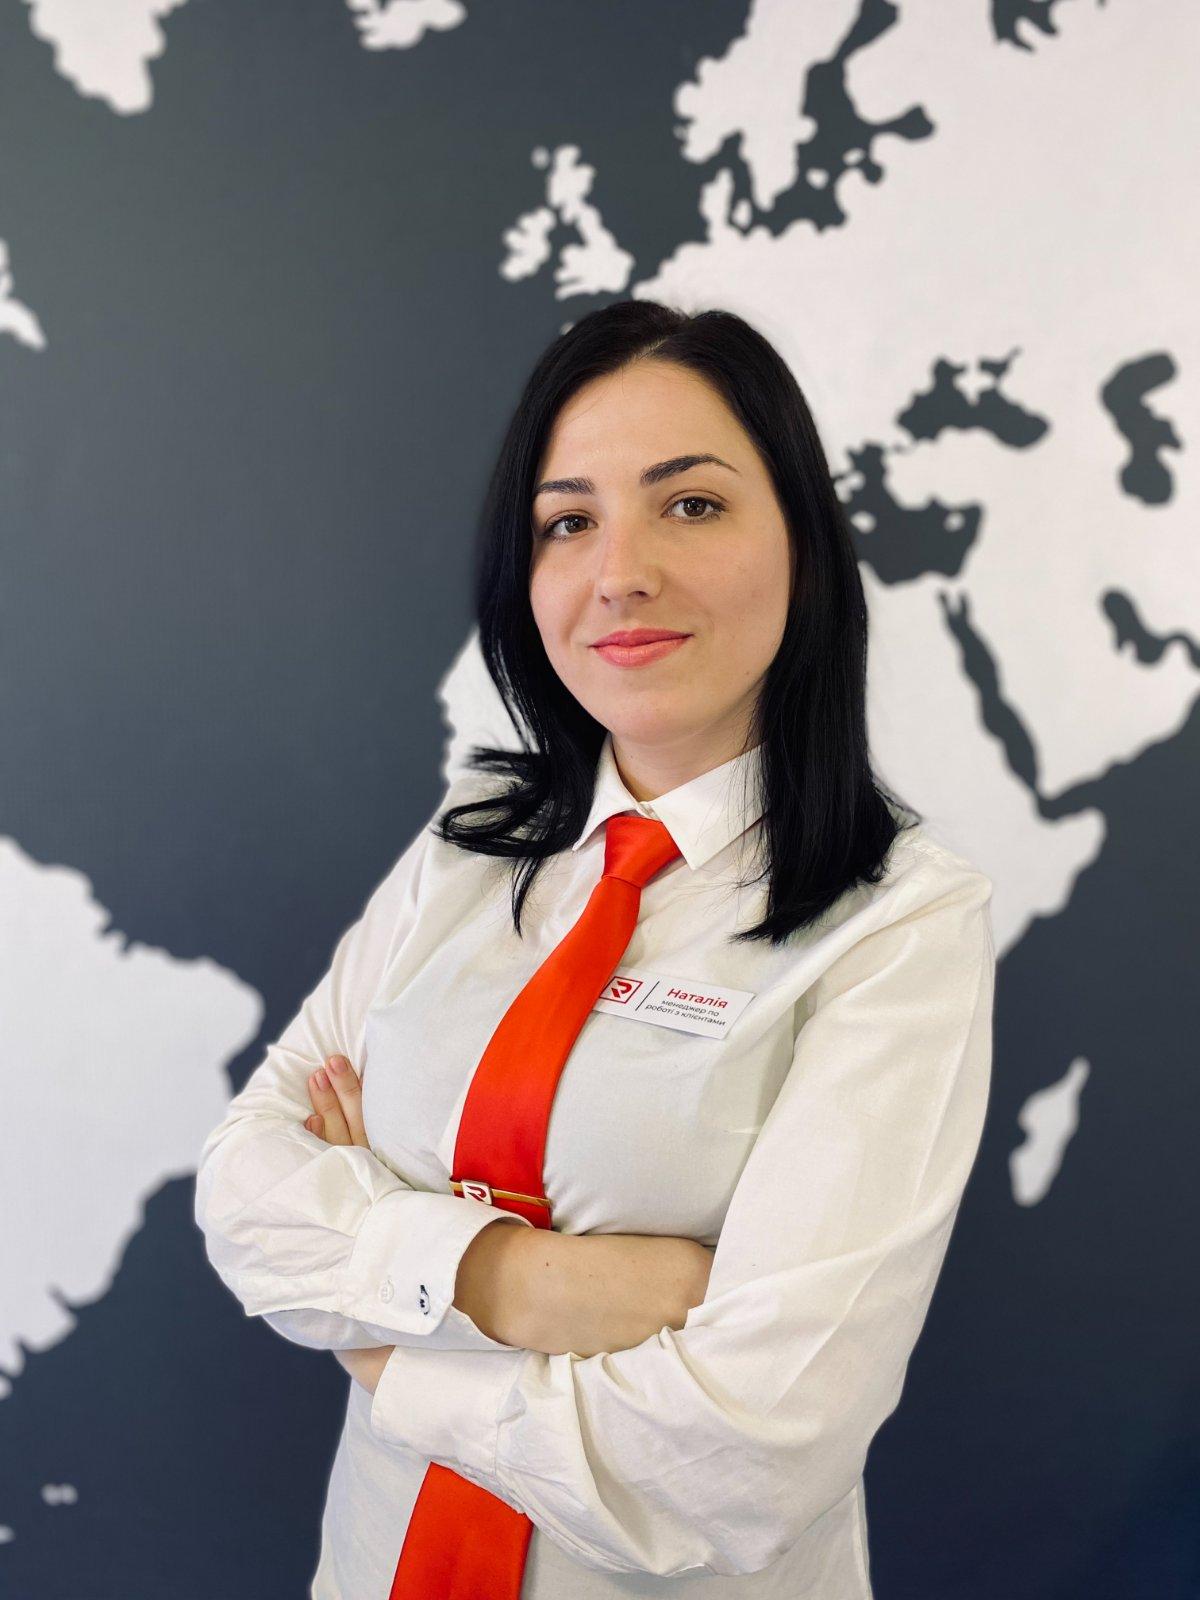 Nataliia_Kucheruk